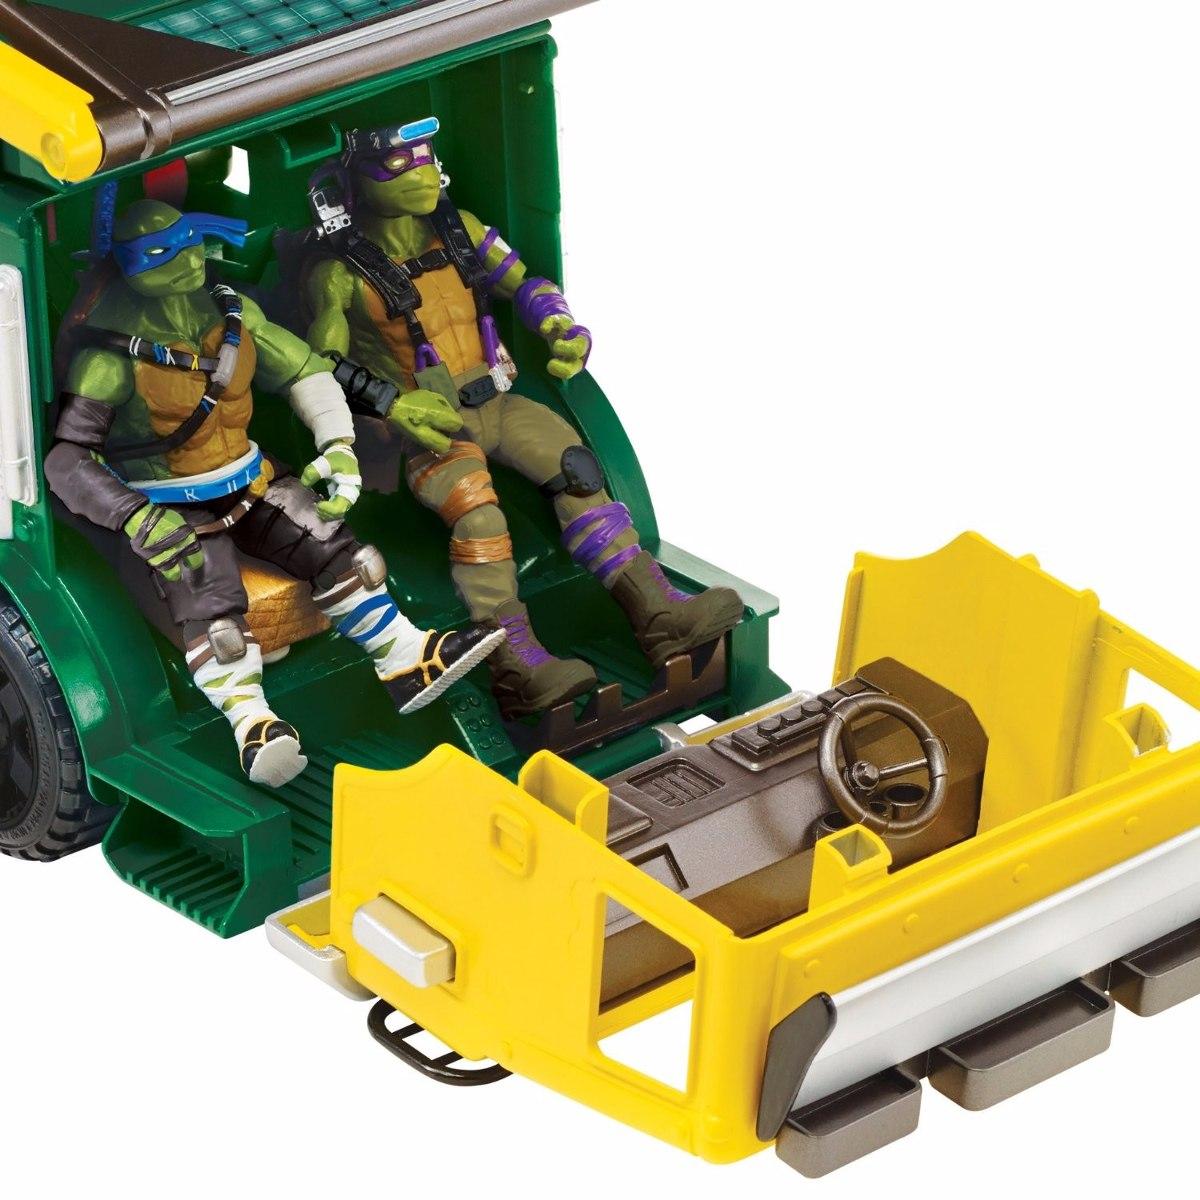 Ninja Tortugas Vehiculo 2 Camion Nuevo Nickelodeon Detallado nwmN80vO